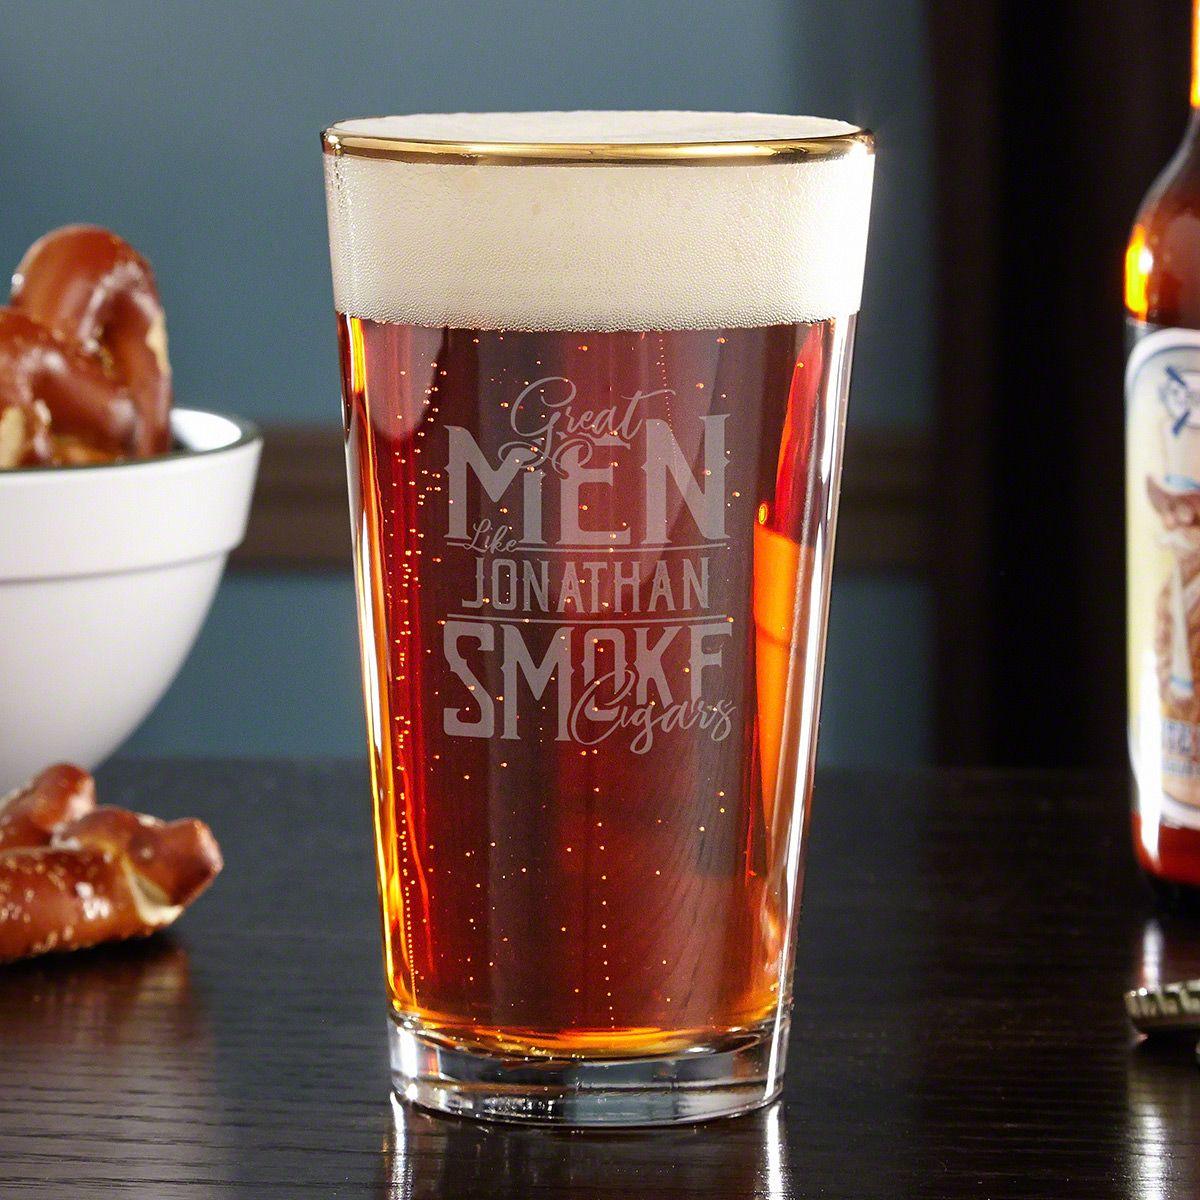 Great Men Smoke Cigars Custom Pint Glass for Beer Lovers